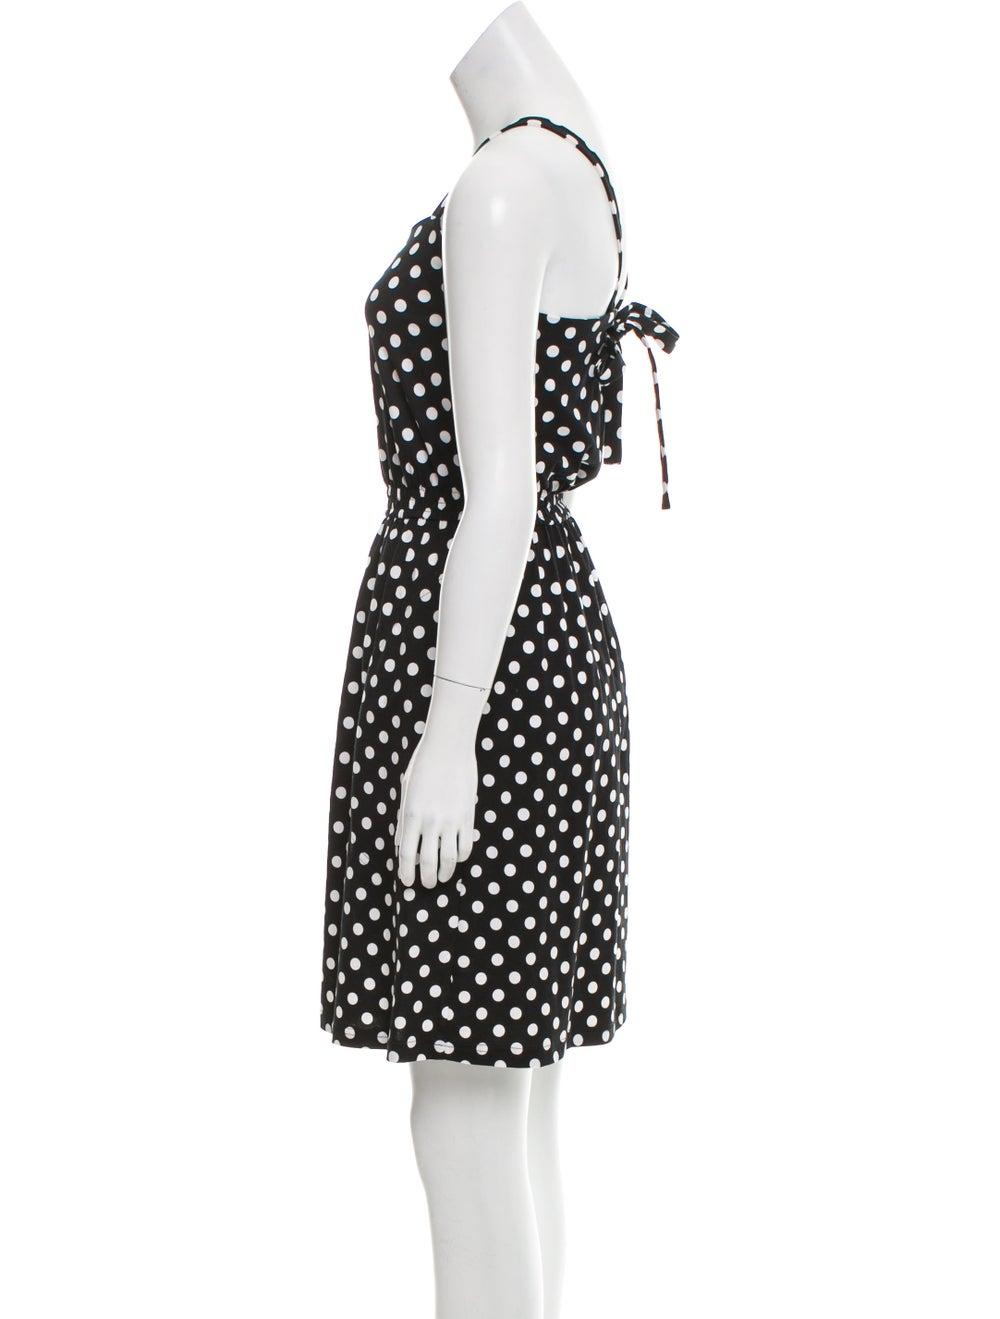 Marimekko Sleeveless Polka Dot Dress Black - image 2